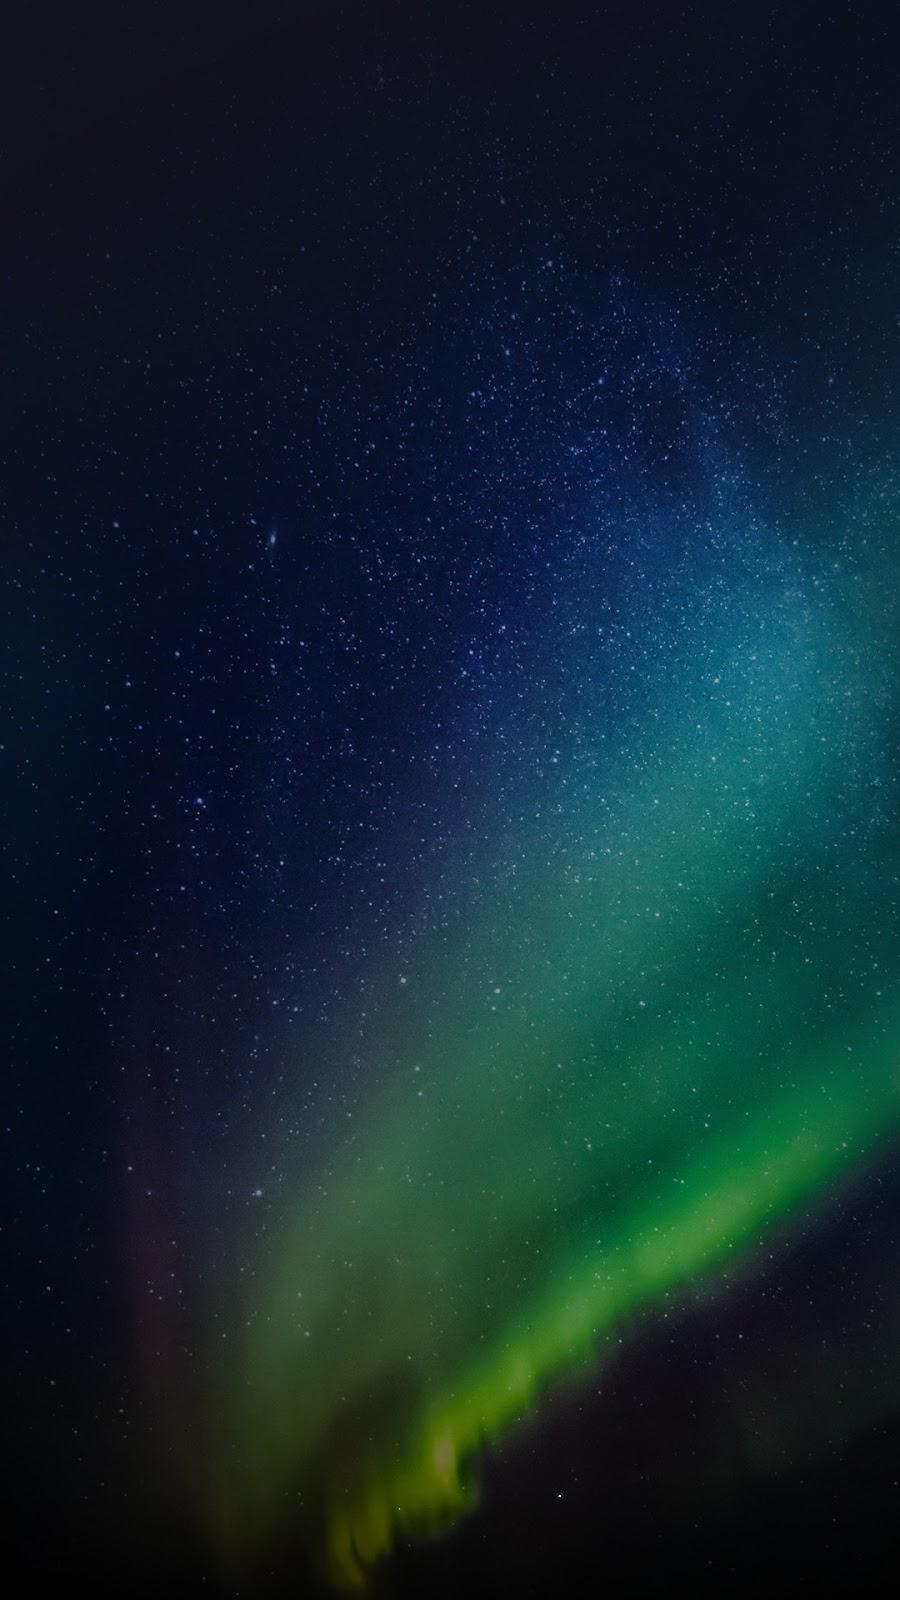 Starry night with aurora